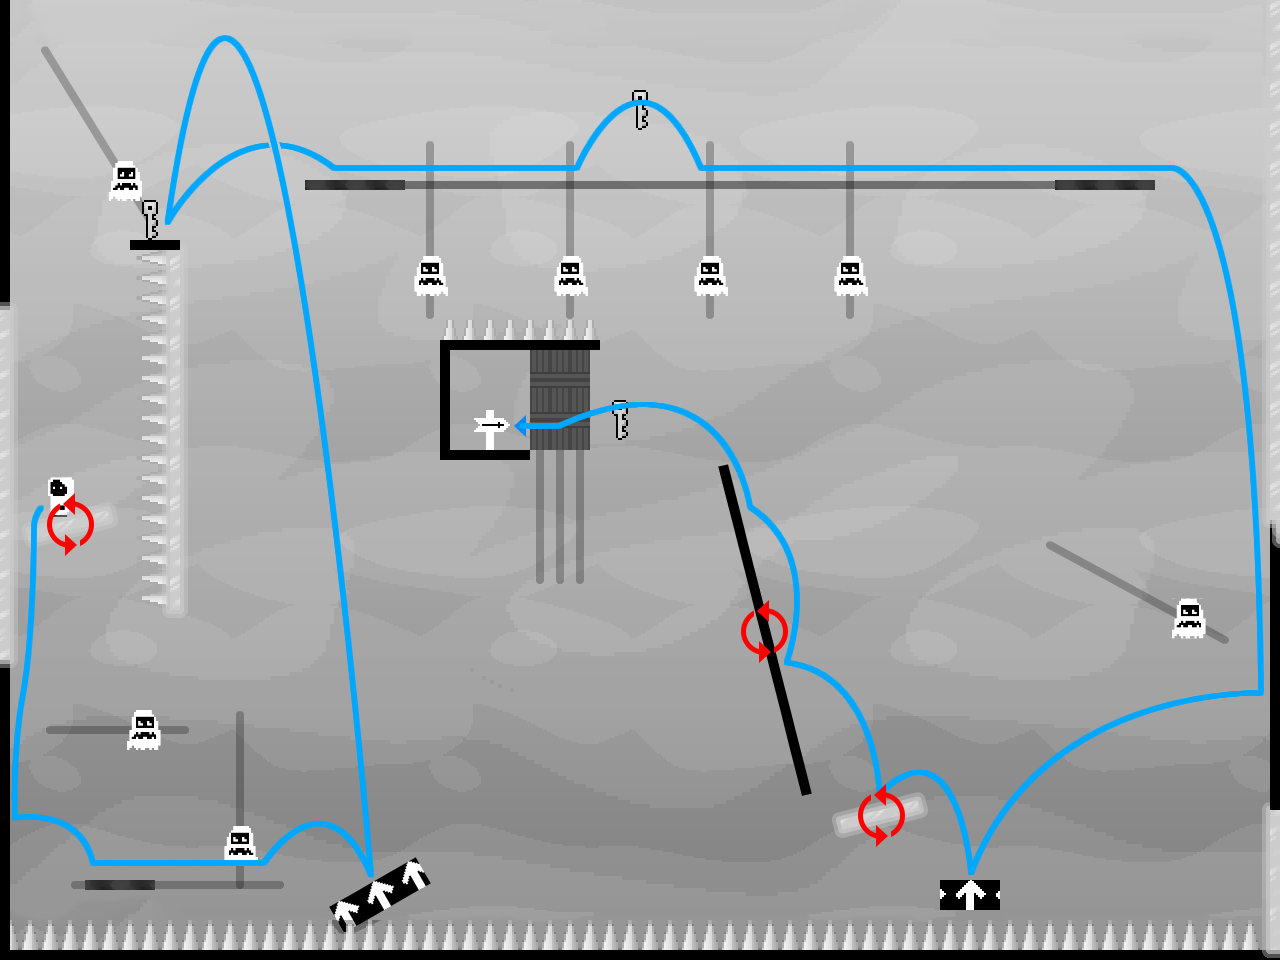 Hollow_Level5Breakdown.png